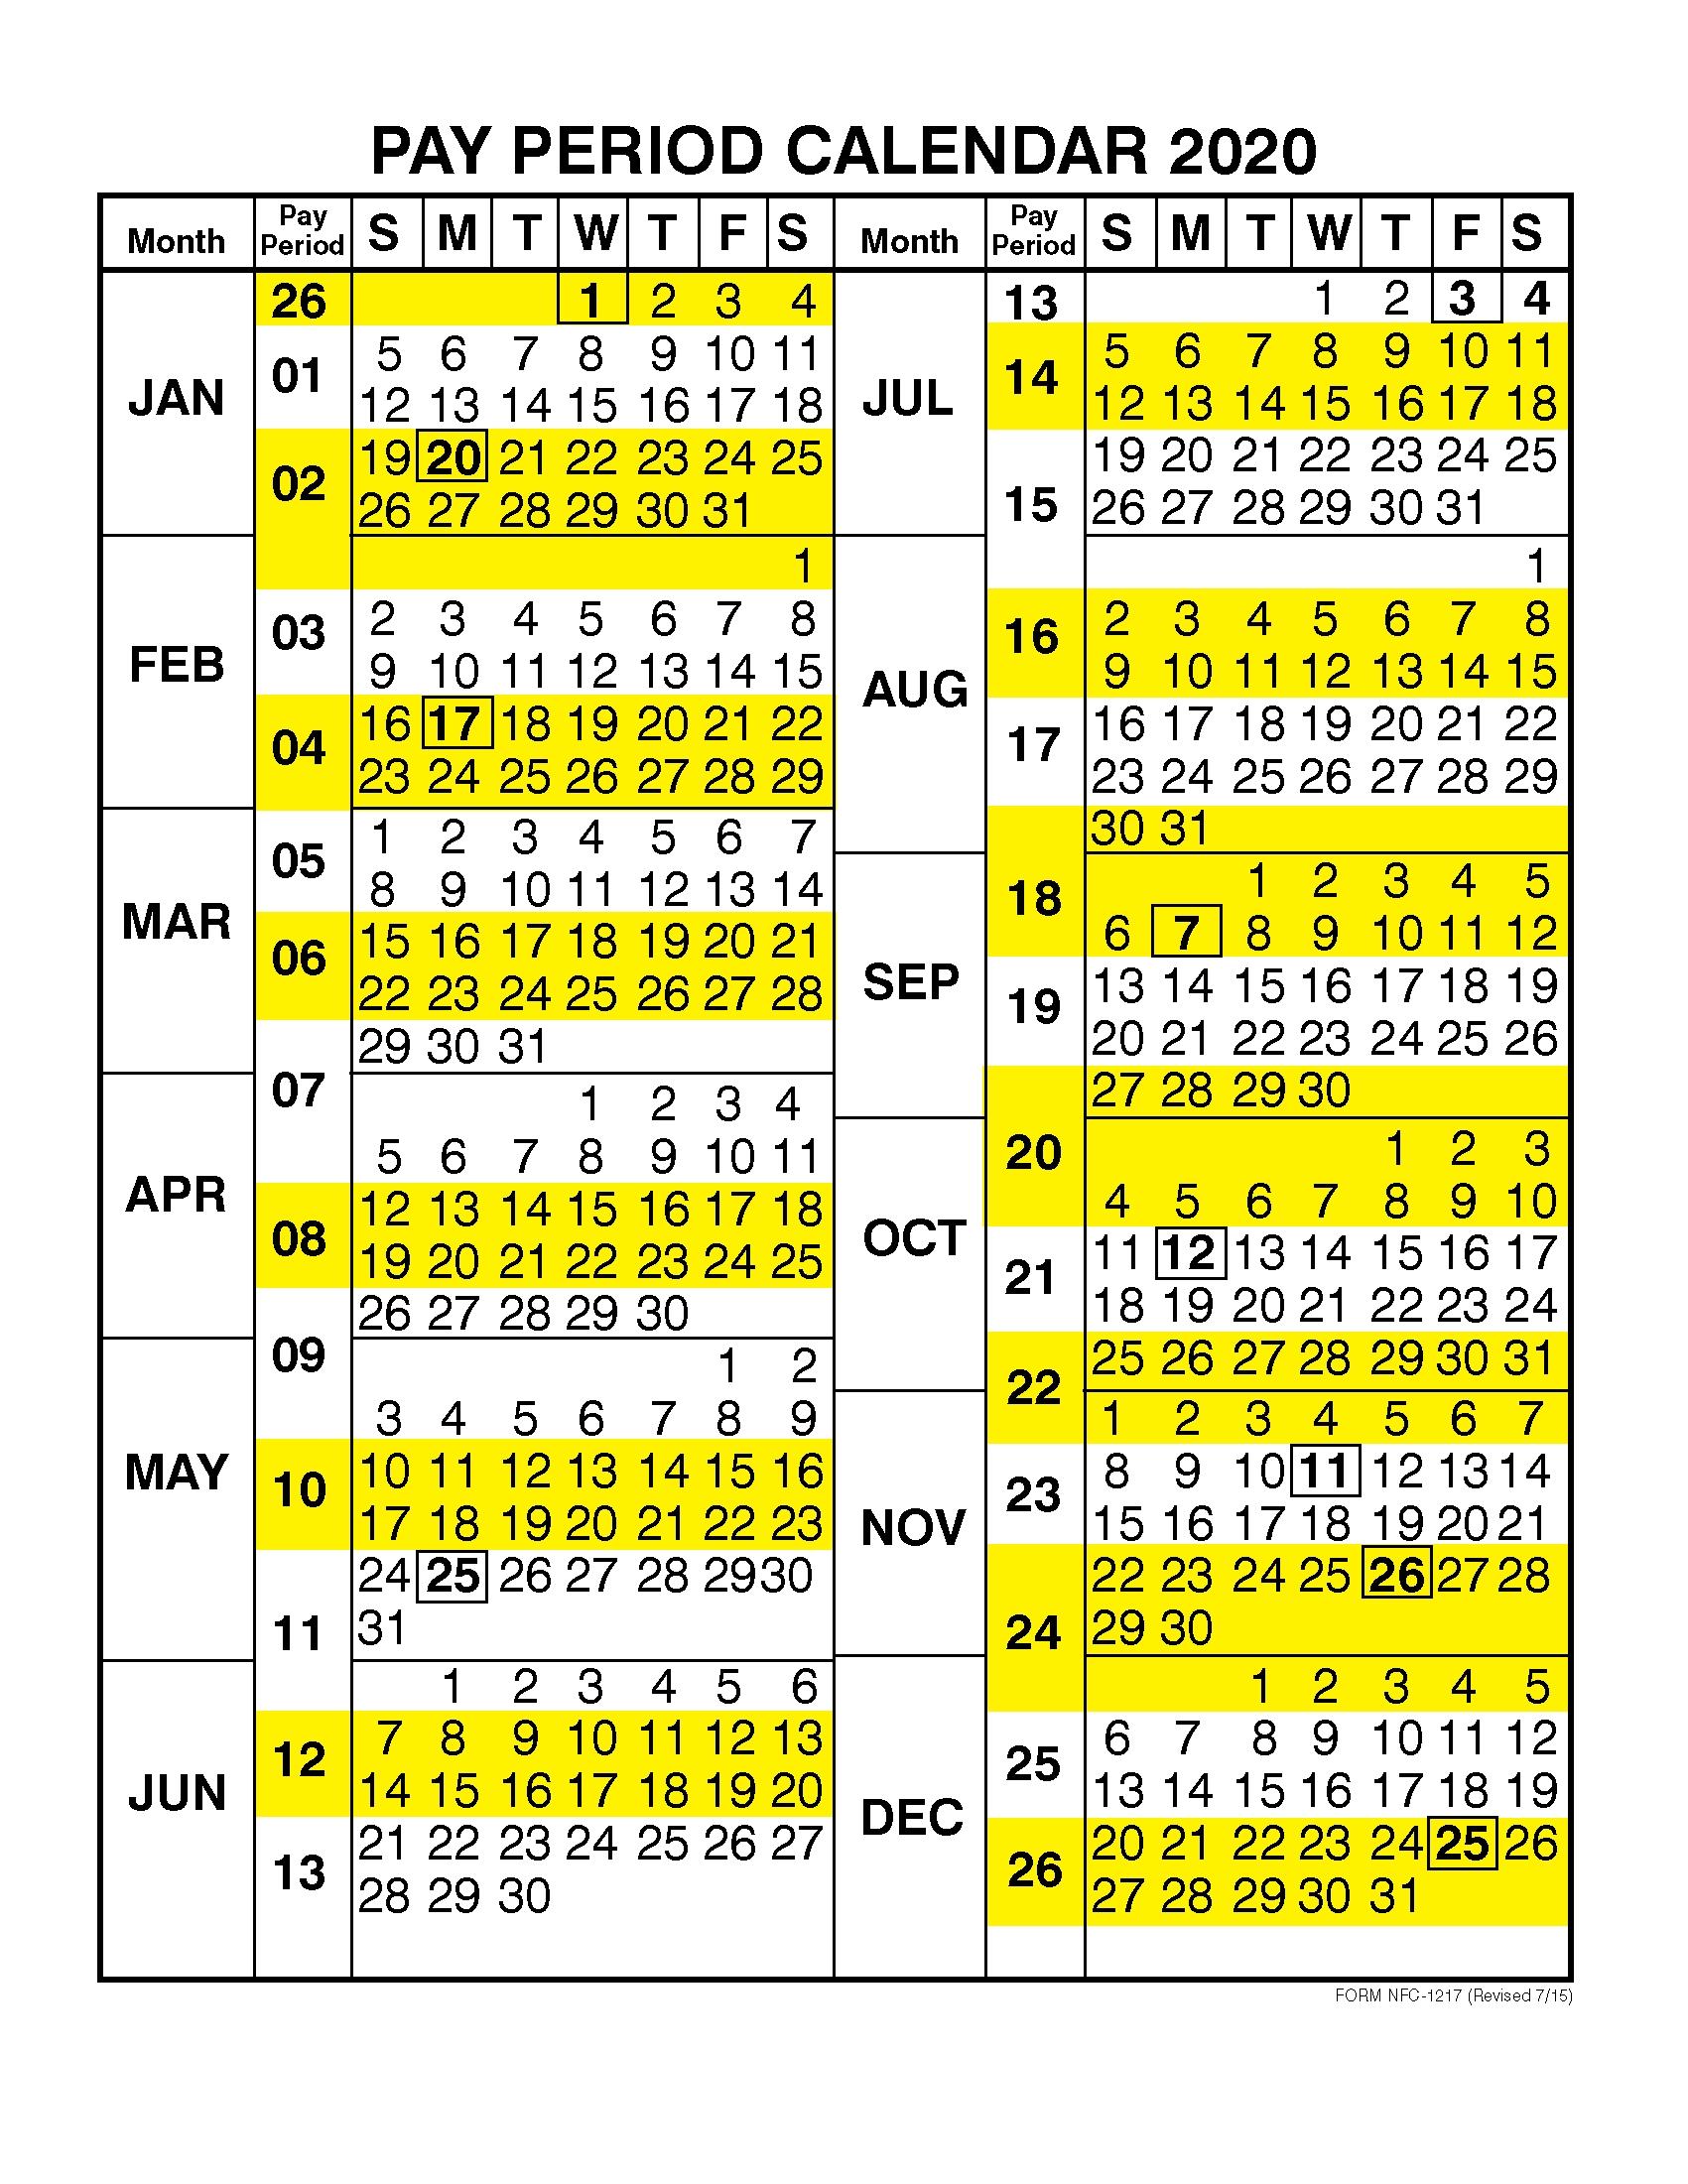 Ctu Payroll Calendar 2020 | 2021 Pay Periods Calendar with regard to Federal Pay Periods 2020 Schedule